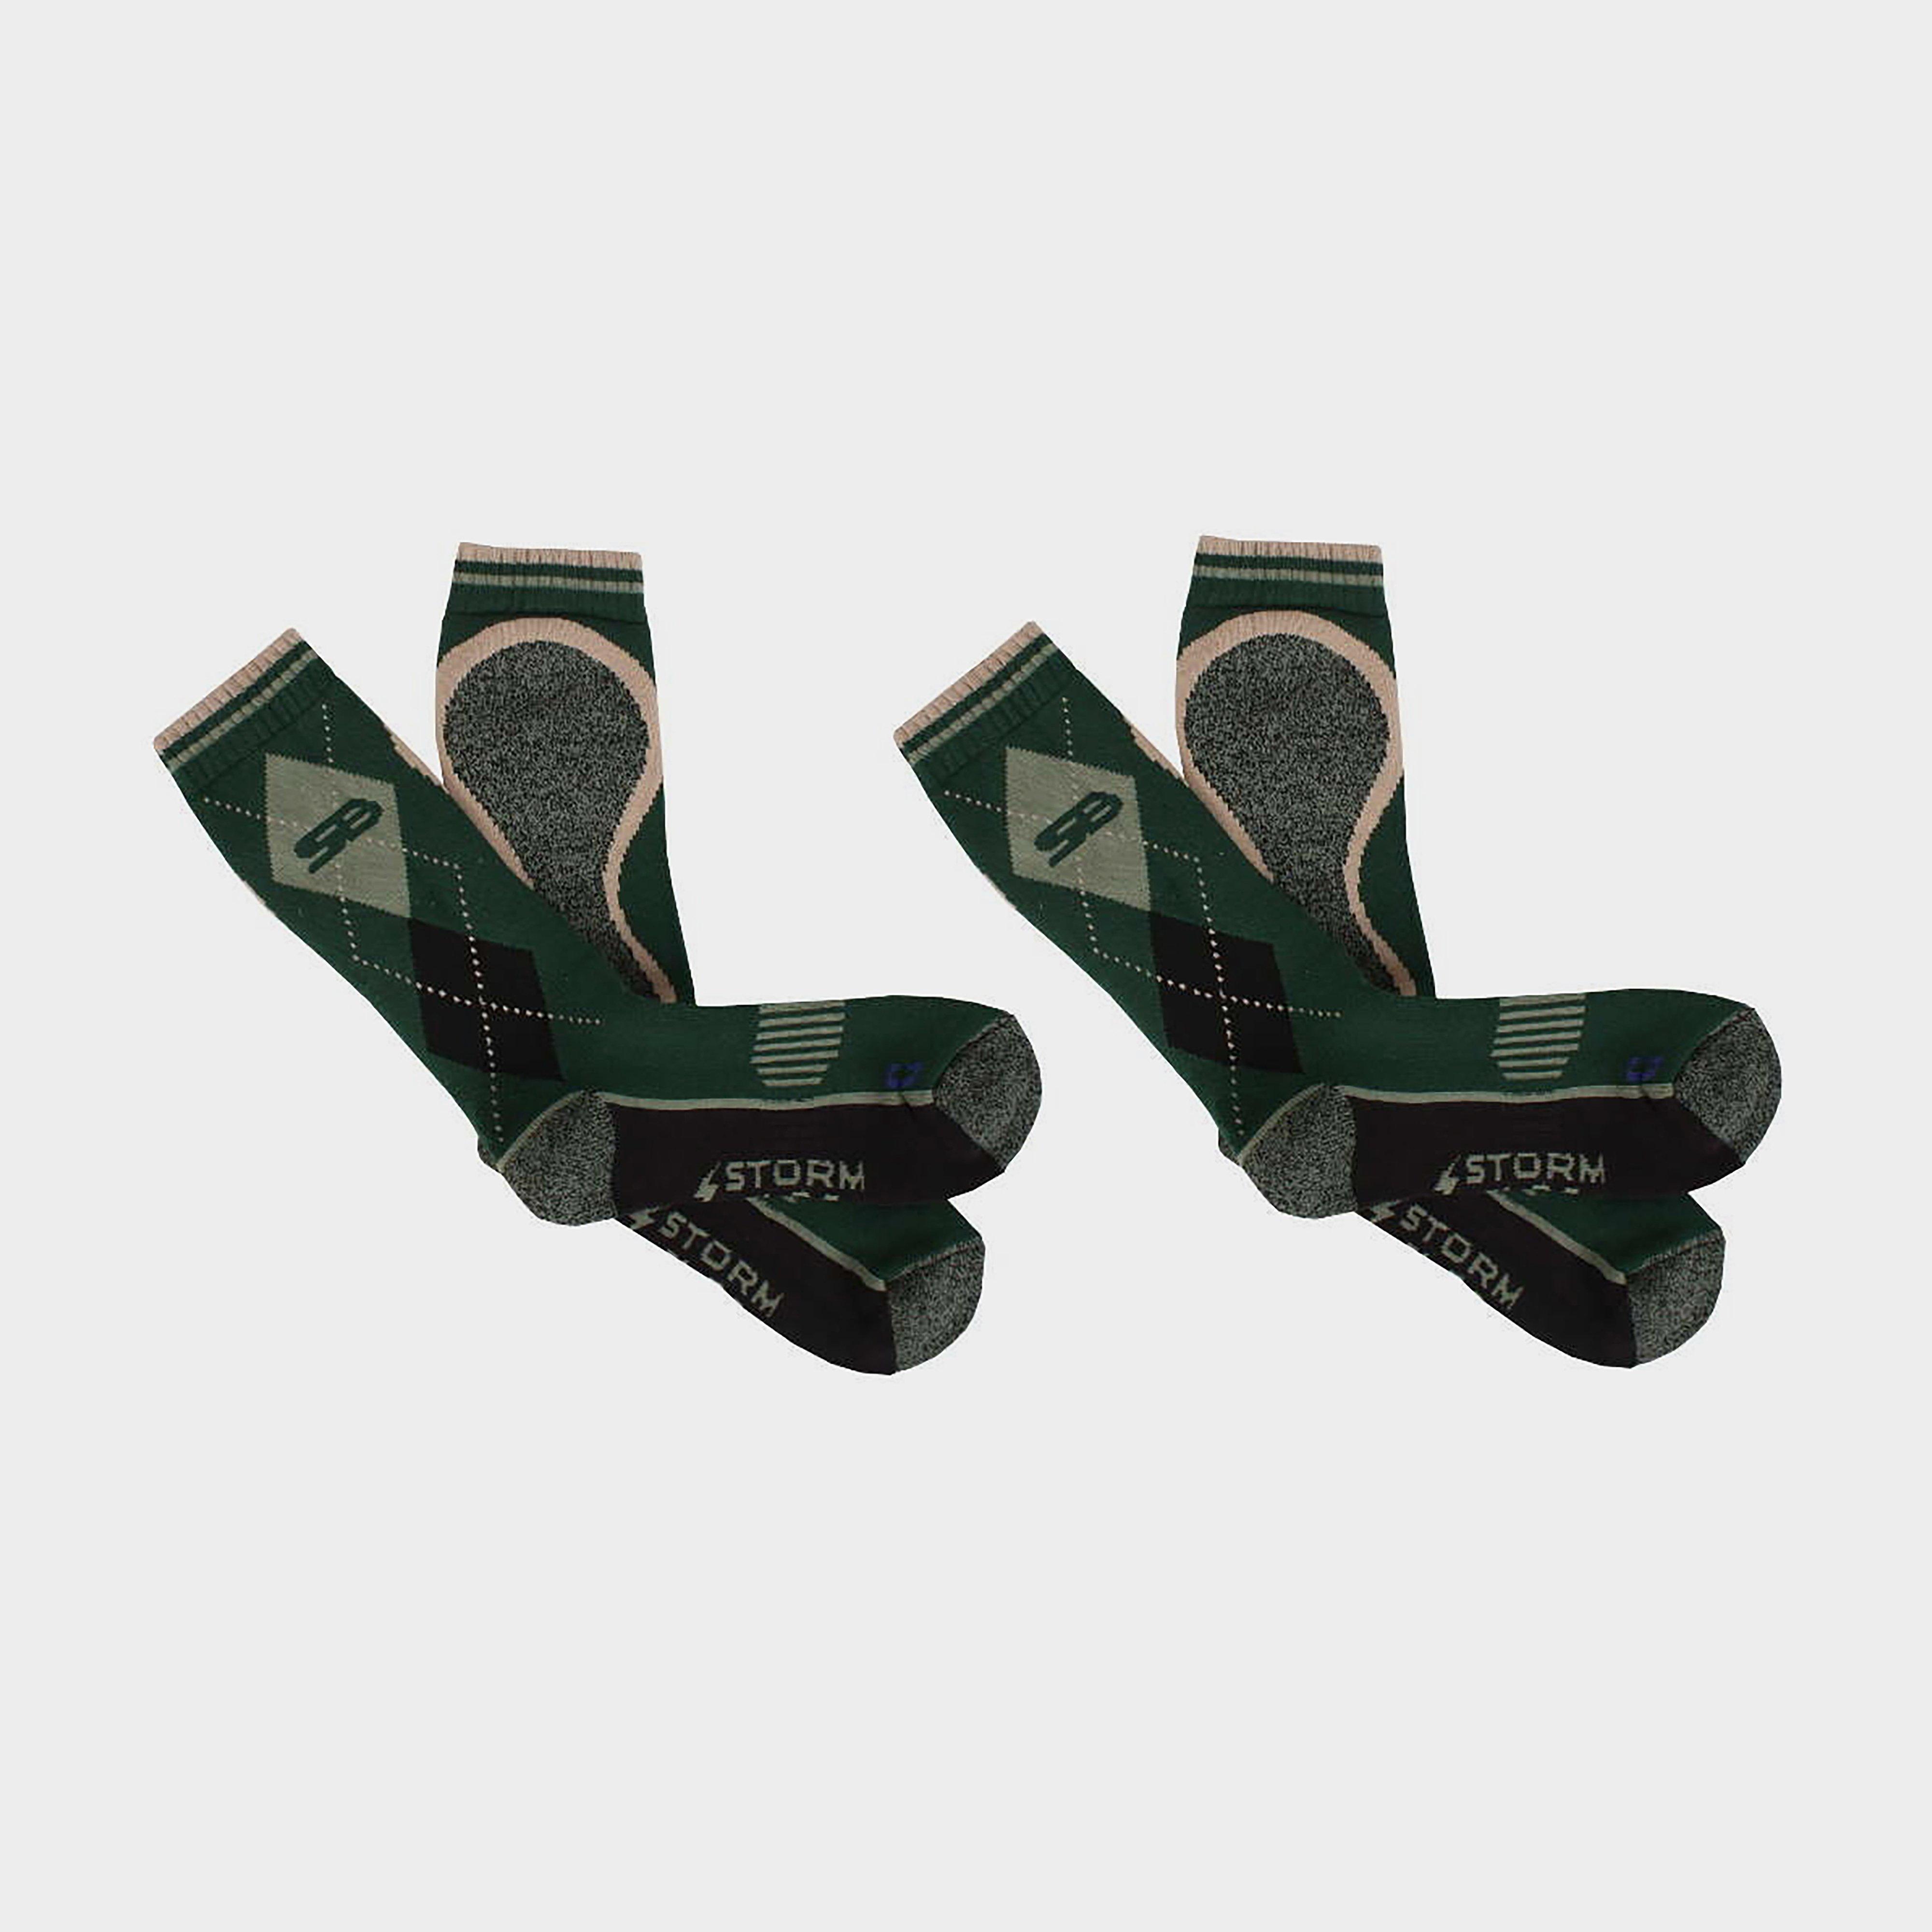 Image of Storm Bloc Women's Beverly Midweight Socks 2 Pack - Green/Green, Green/Green